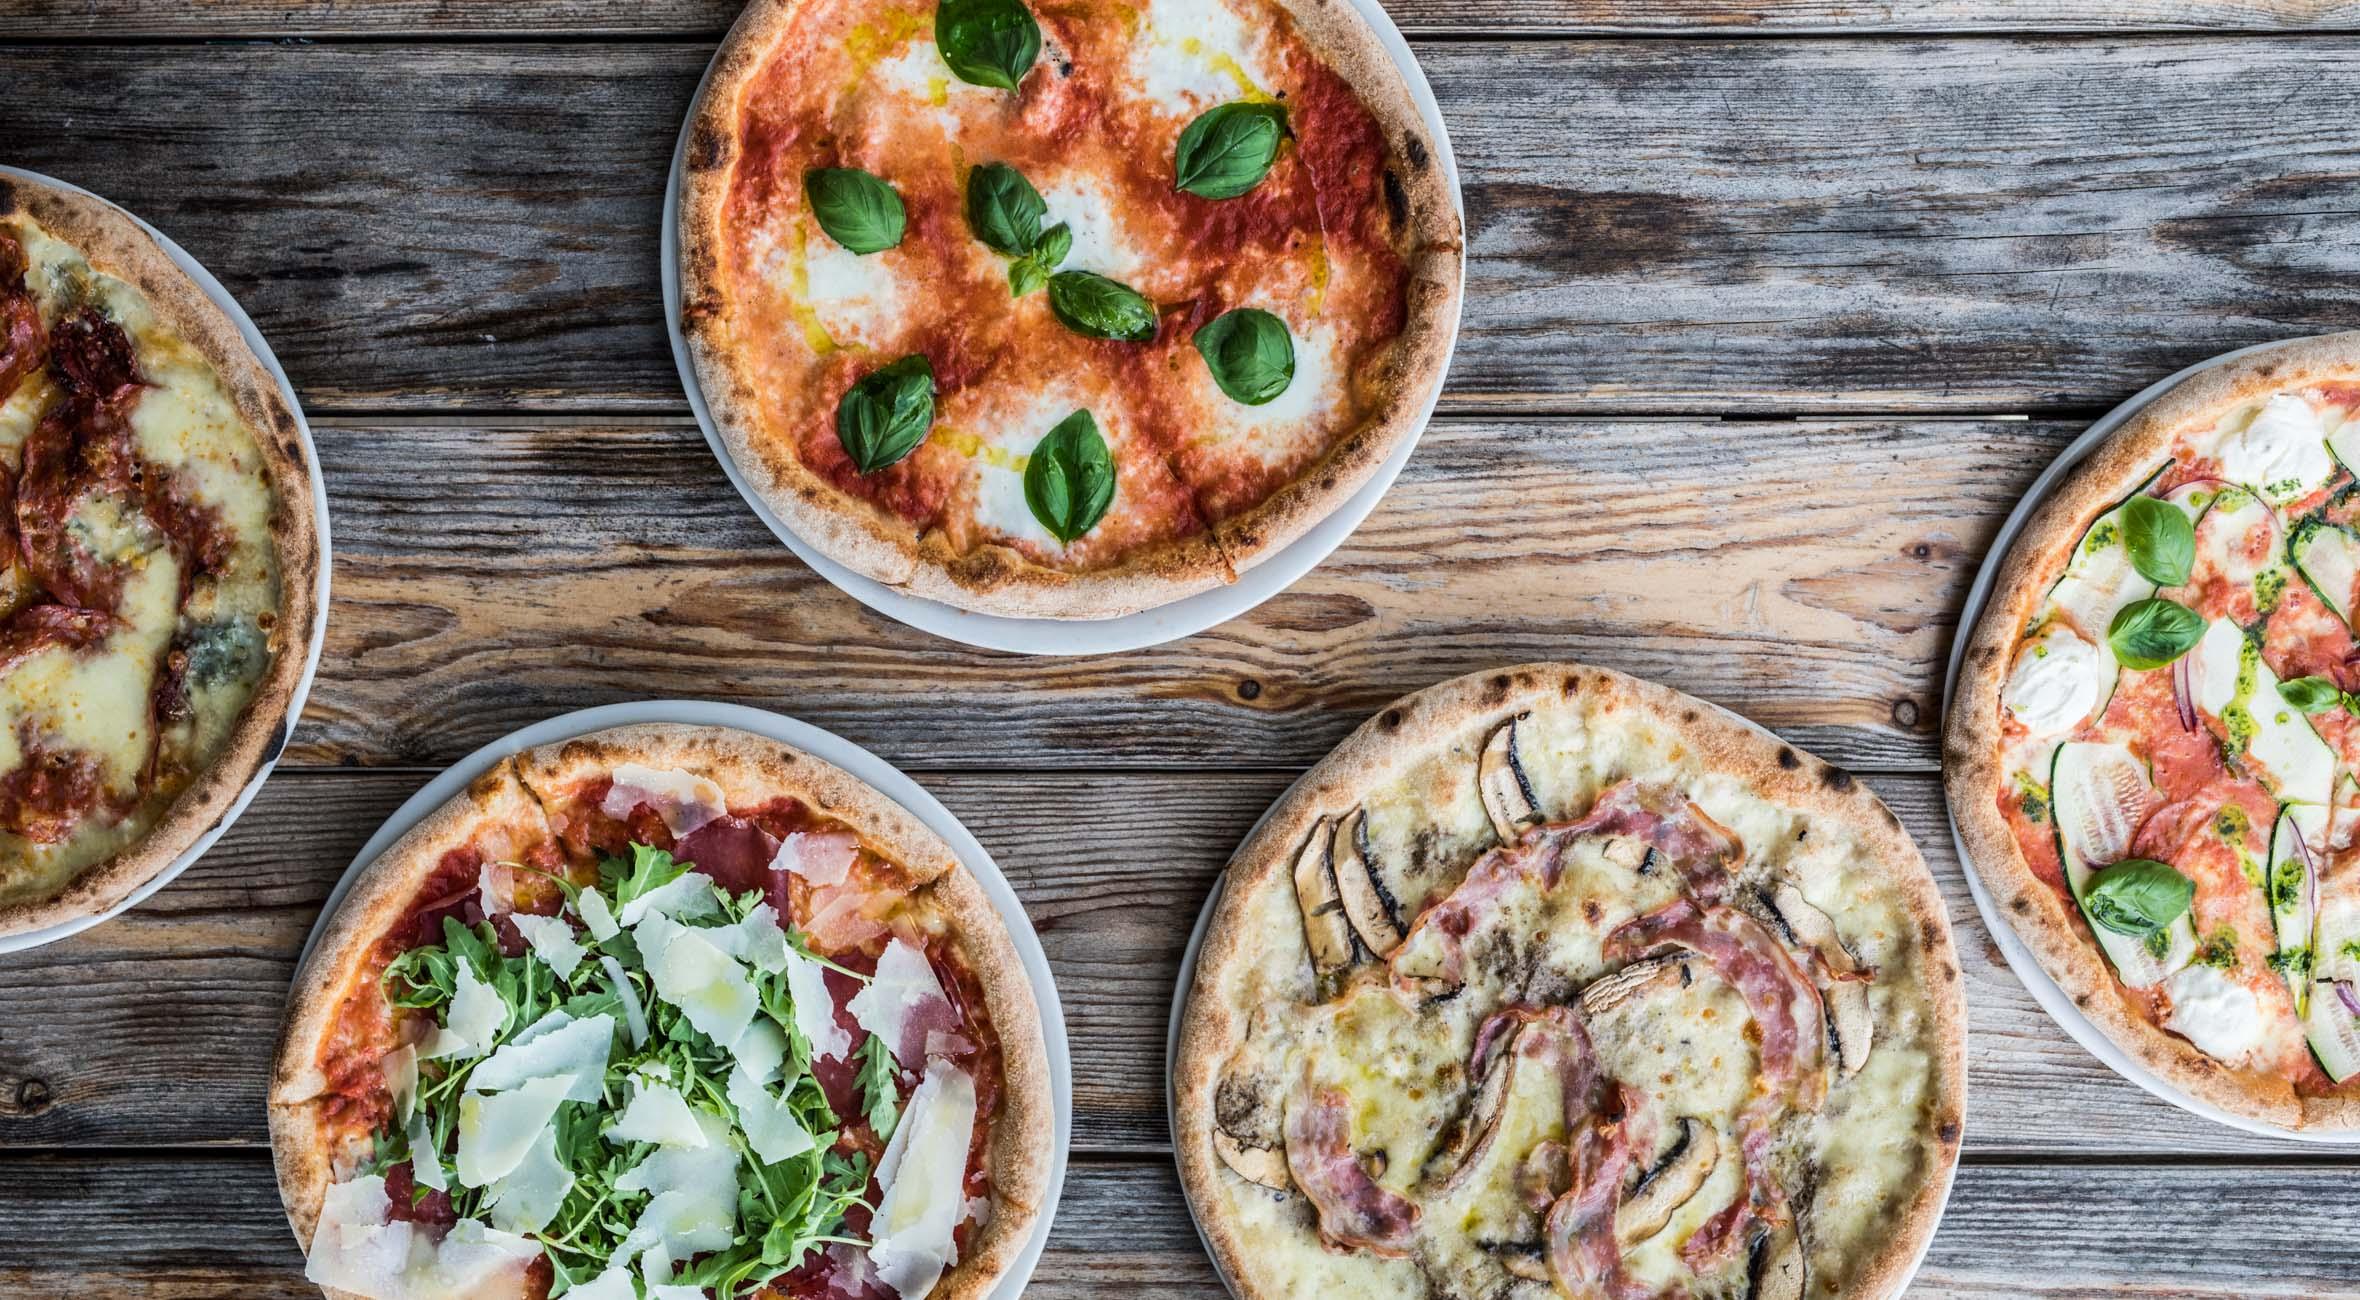 2 valgfrie pizzaer hos Bar Uno – Anerkendte restauratører bag hip pizzabar i det nye Nordhavn